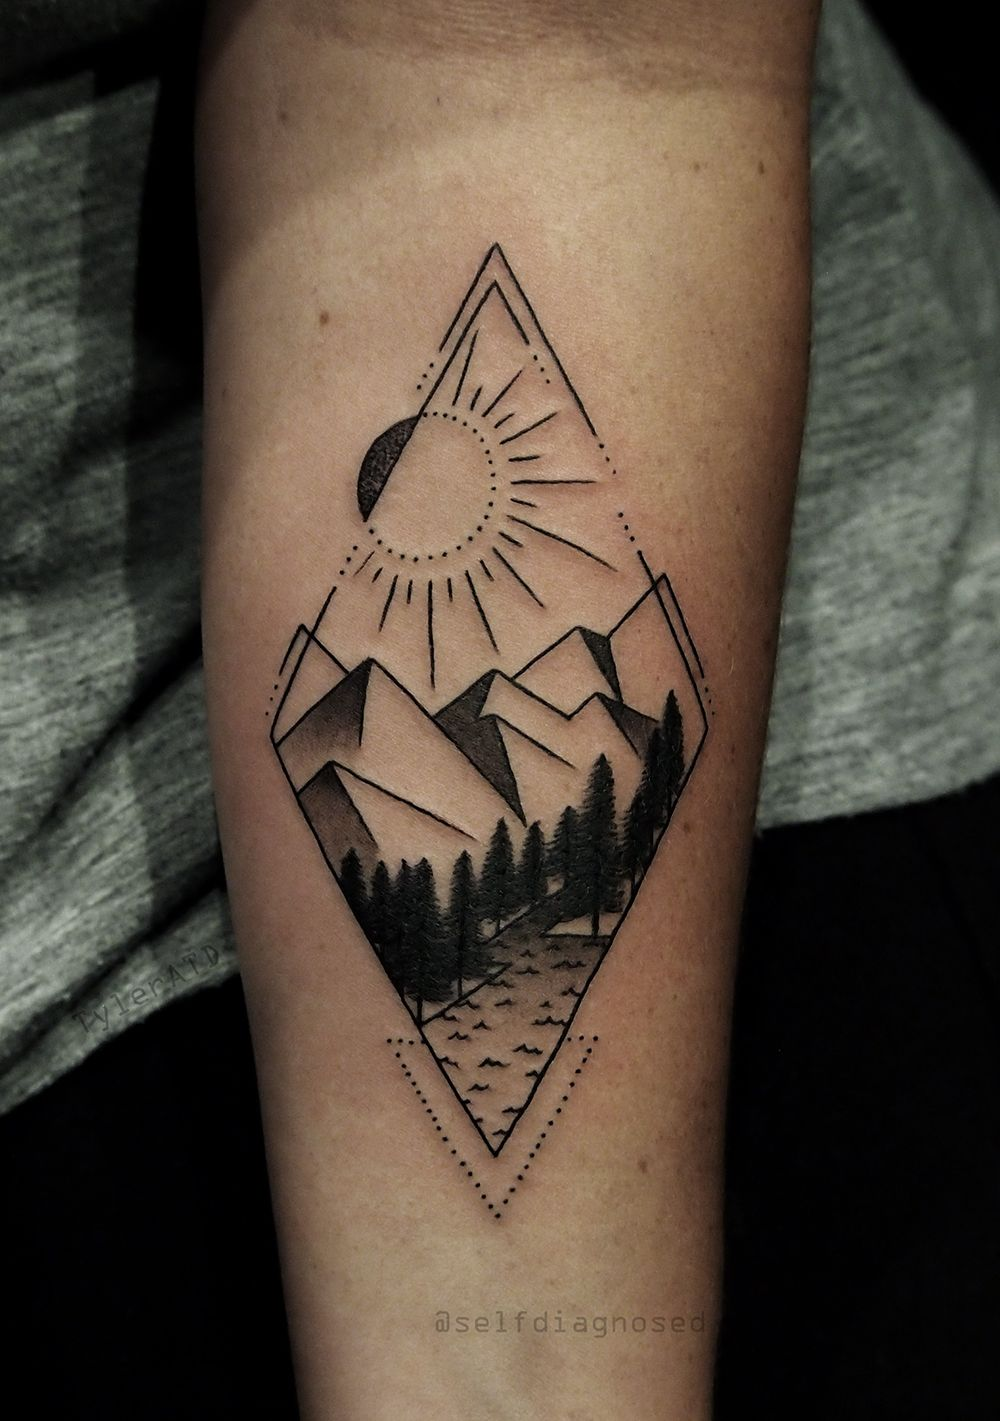 50 Geometric Mountain Tattoo Designs For Men – Geometry Ink Ideas 50 Geometric Mountain Tattoo Designs For Men – Geometry Ink Ideas new picture